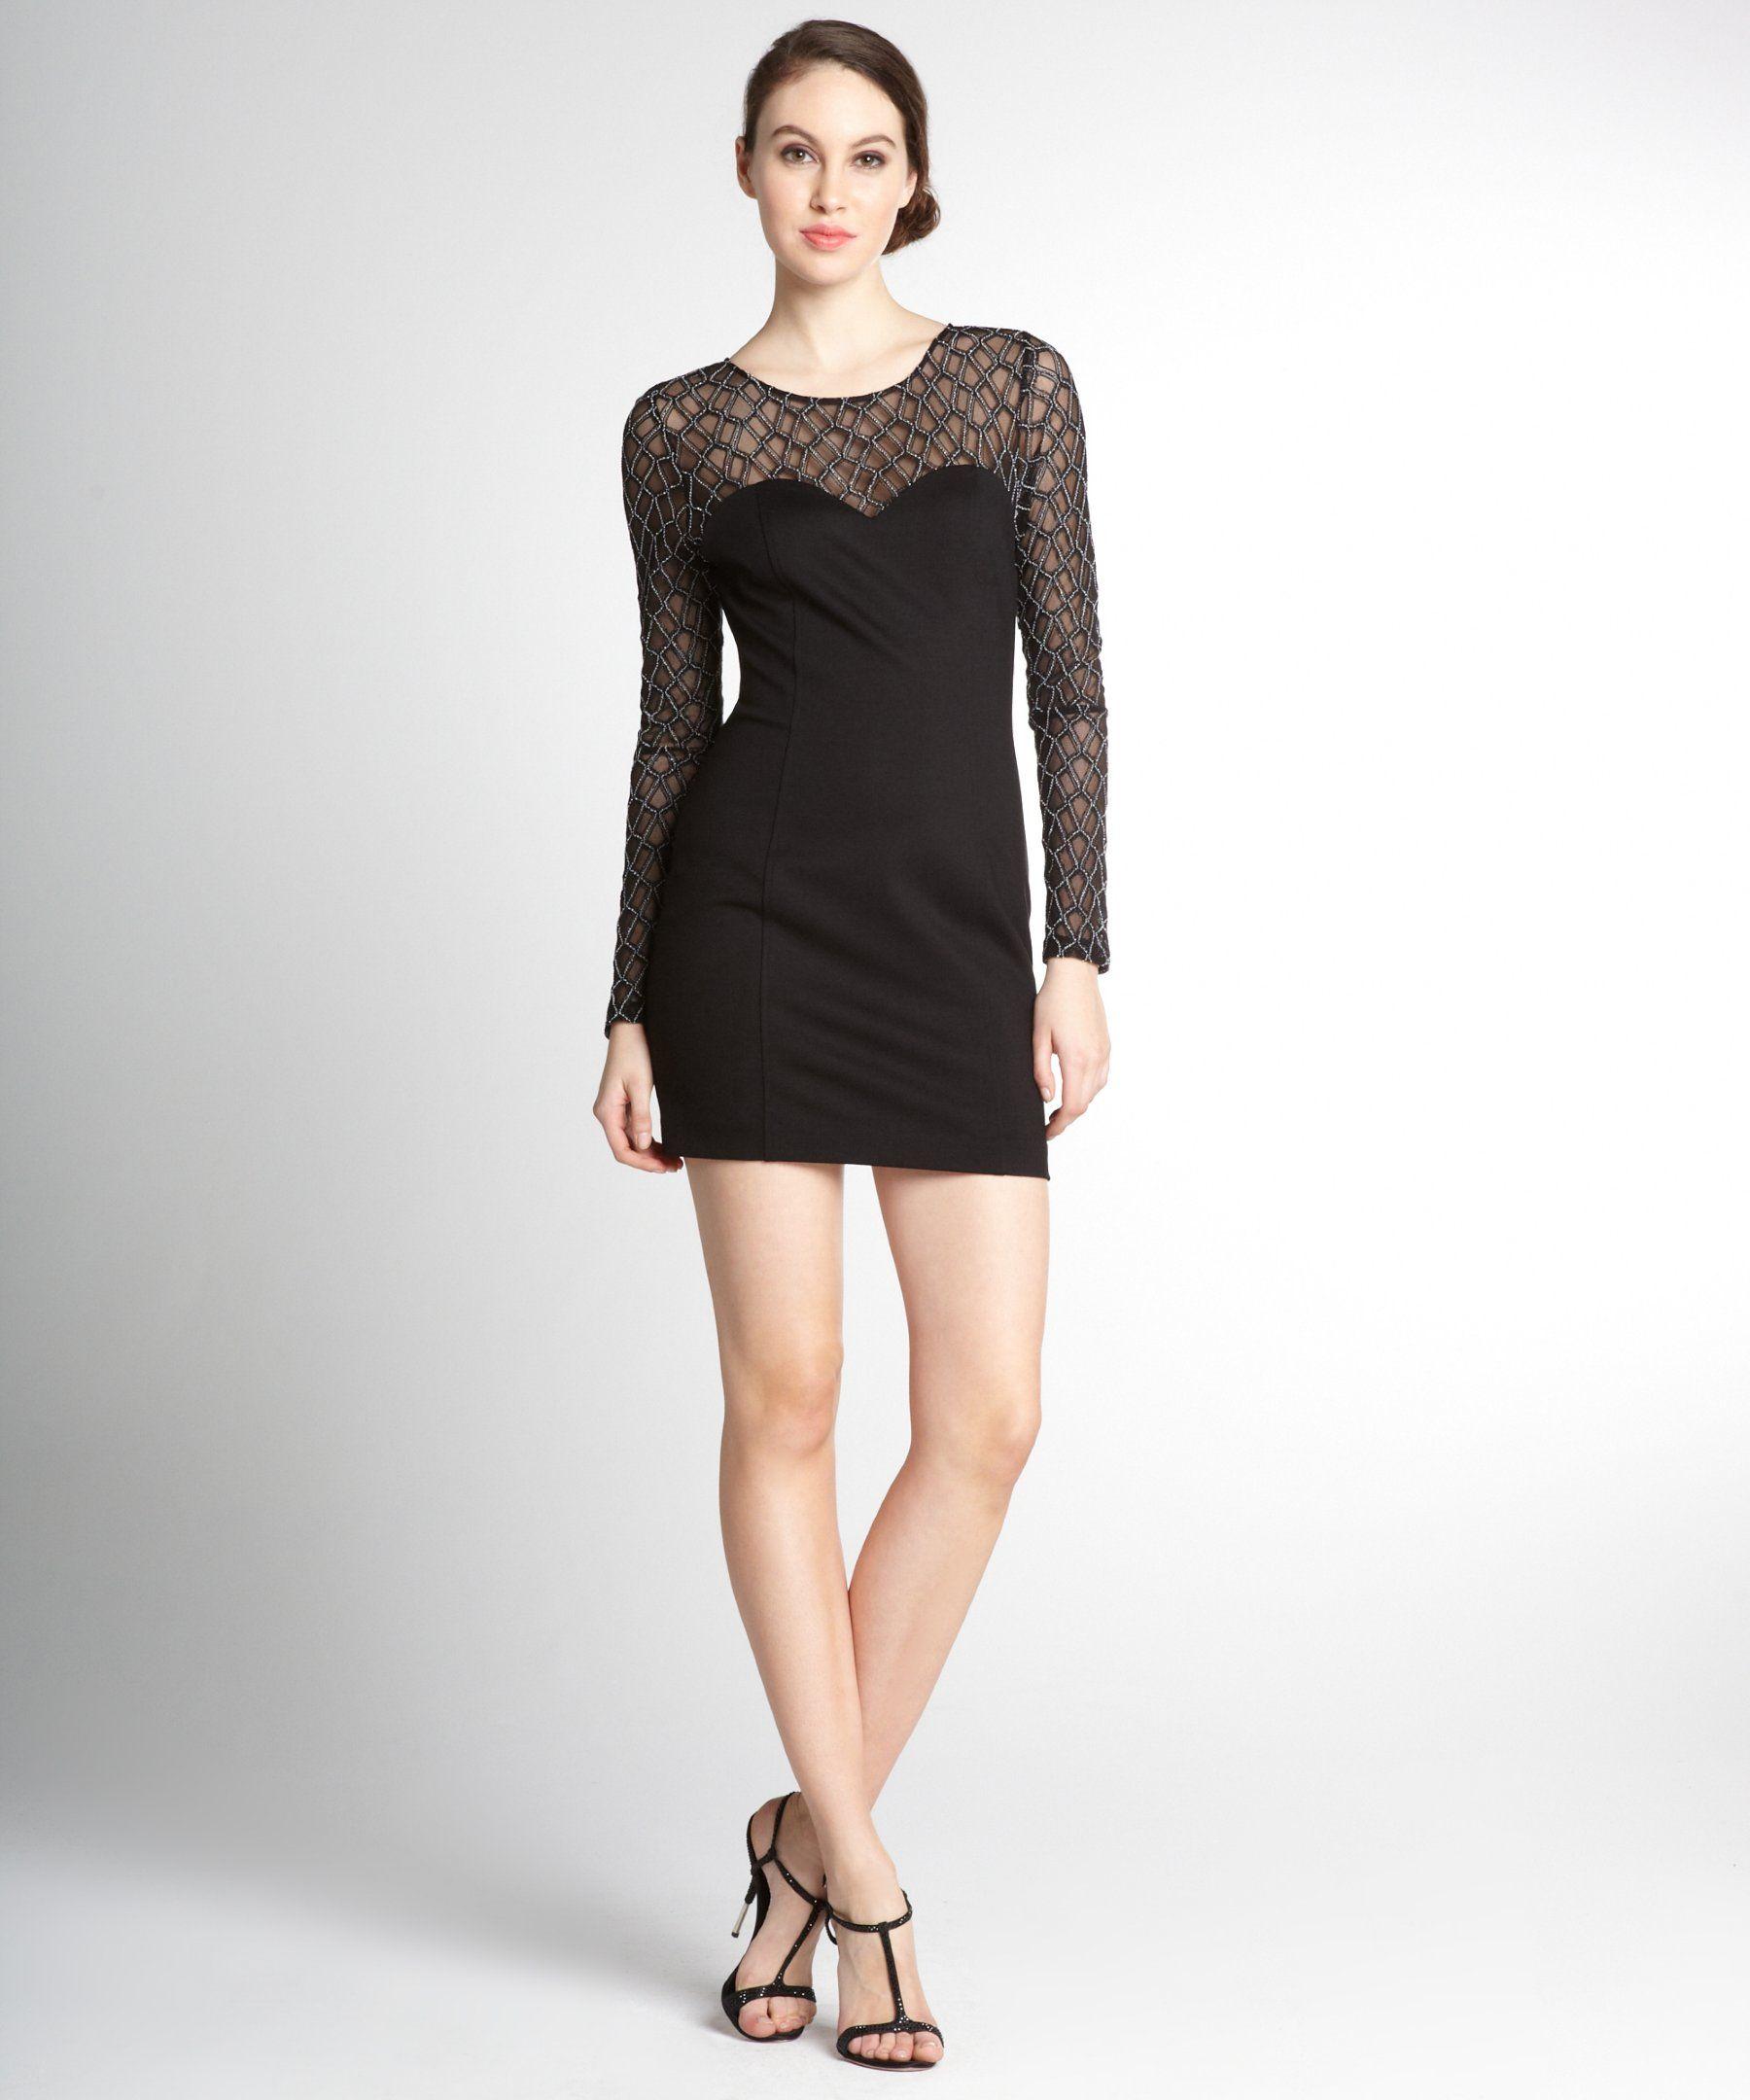 Monamour Black Beaded Stretch Mesh Top Bambi Long Sleeve Dress Bluefly Black Long Sleeve Dress Kohls Dresses Dresses [ 2160 x 1800 Pixel ]